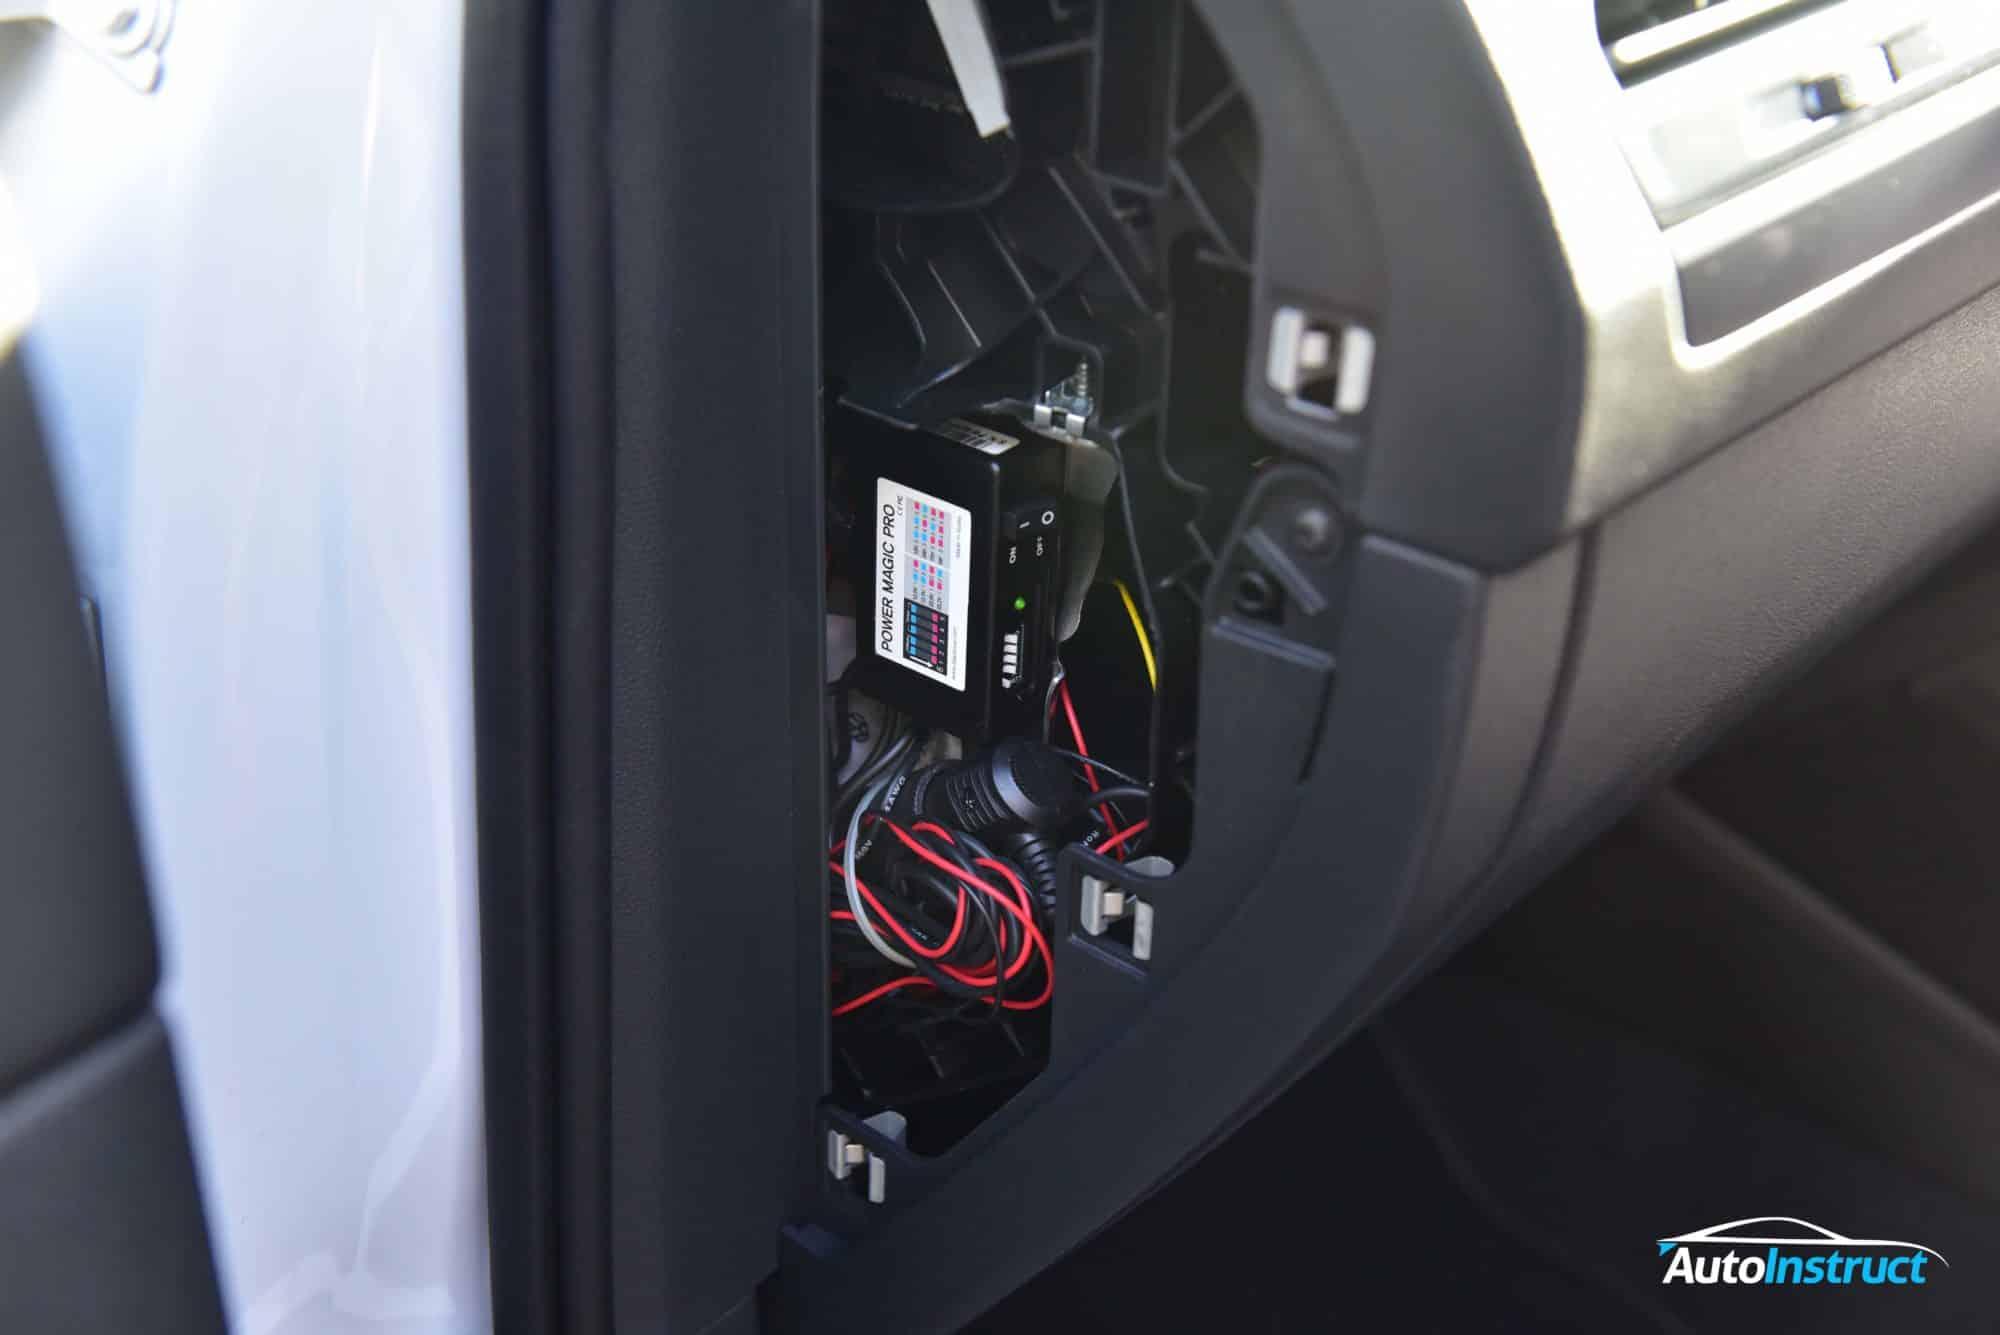 MK2 Tiguan Dash Cam Install